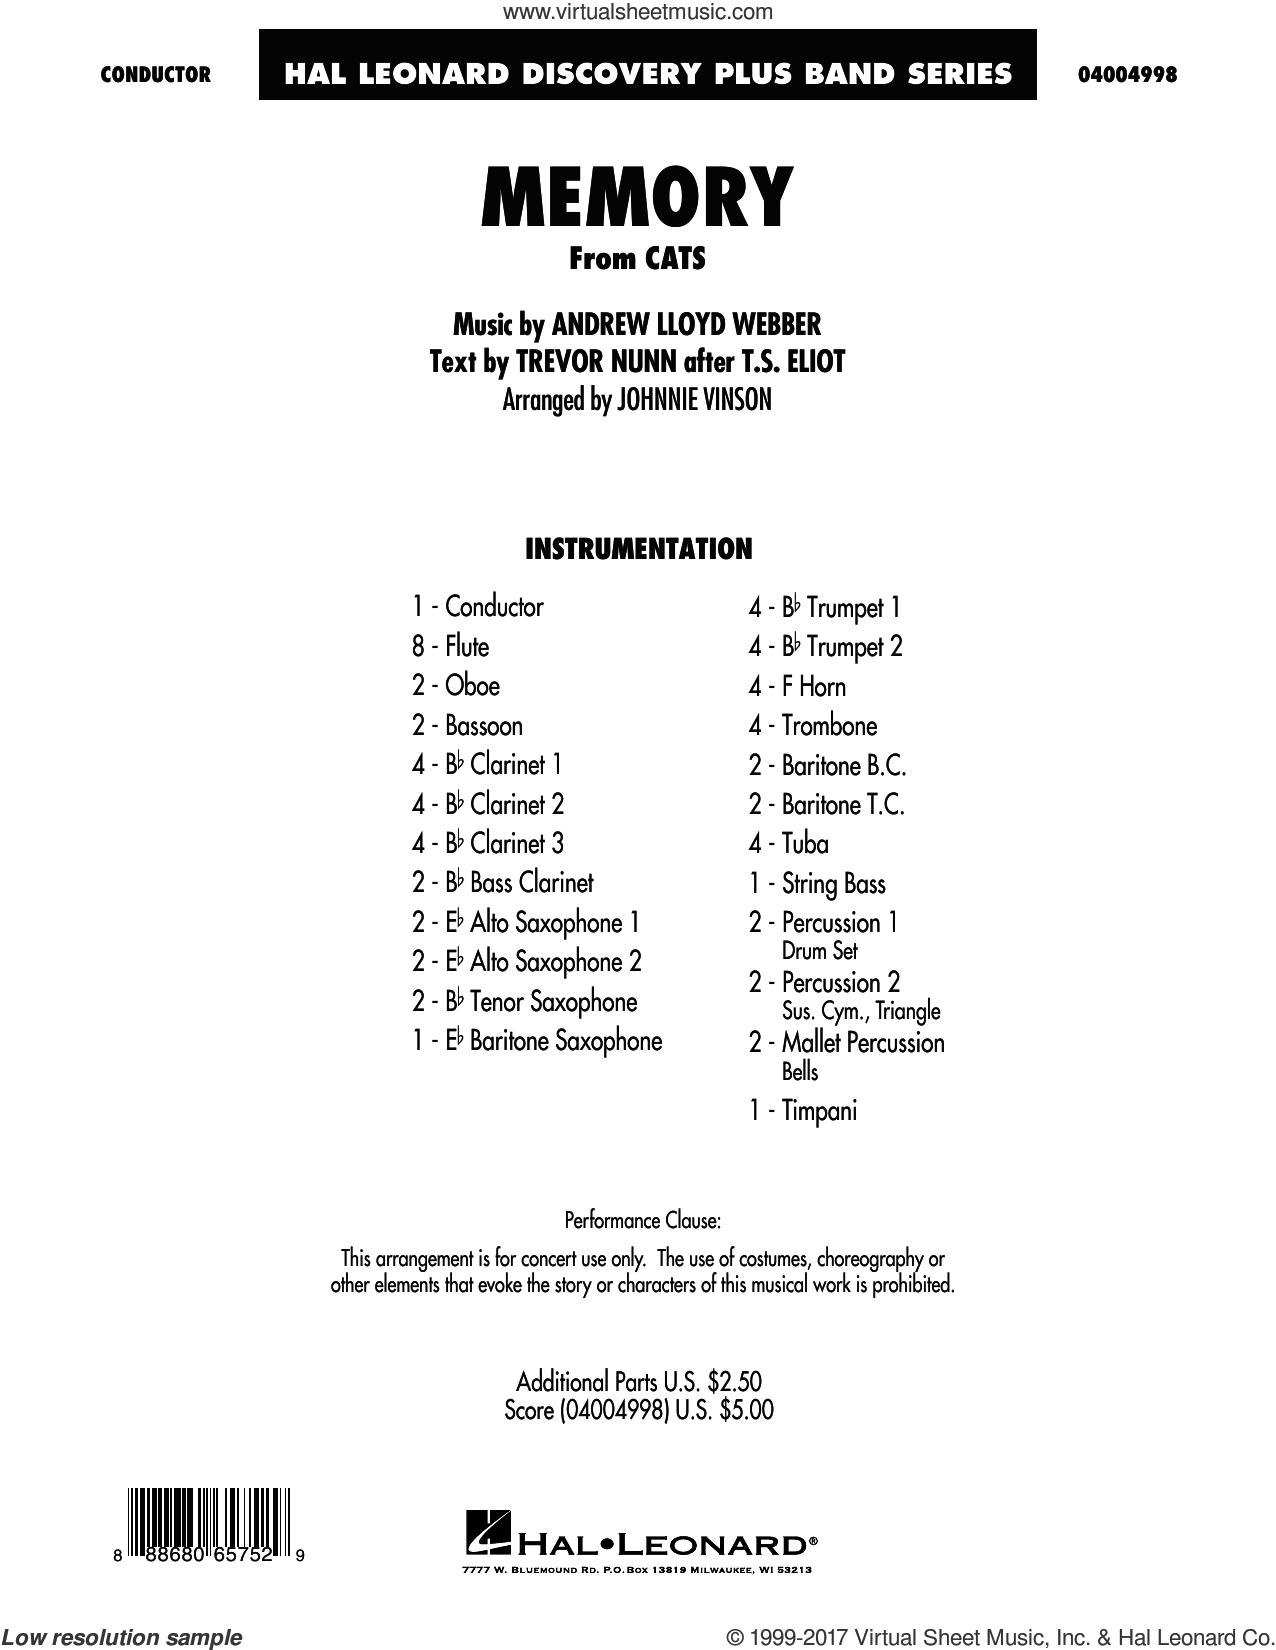 Memory (from Cats) (arr. Johnnie Vinson) (COMPLETE) sheet music for concert band by Andrew Lloyd Webber, Barbra Streisand, Johnnie Vinson and Trevor Nunn, intermediate skill level